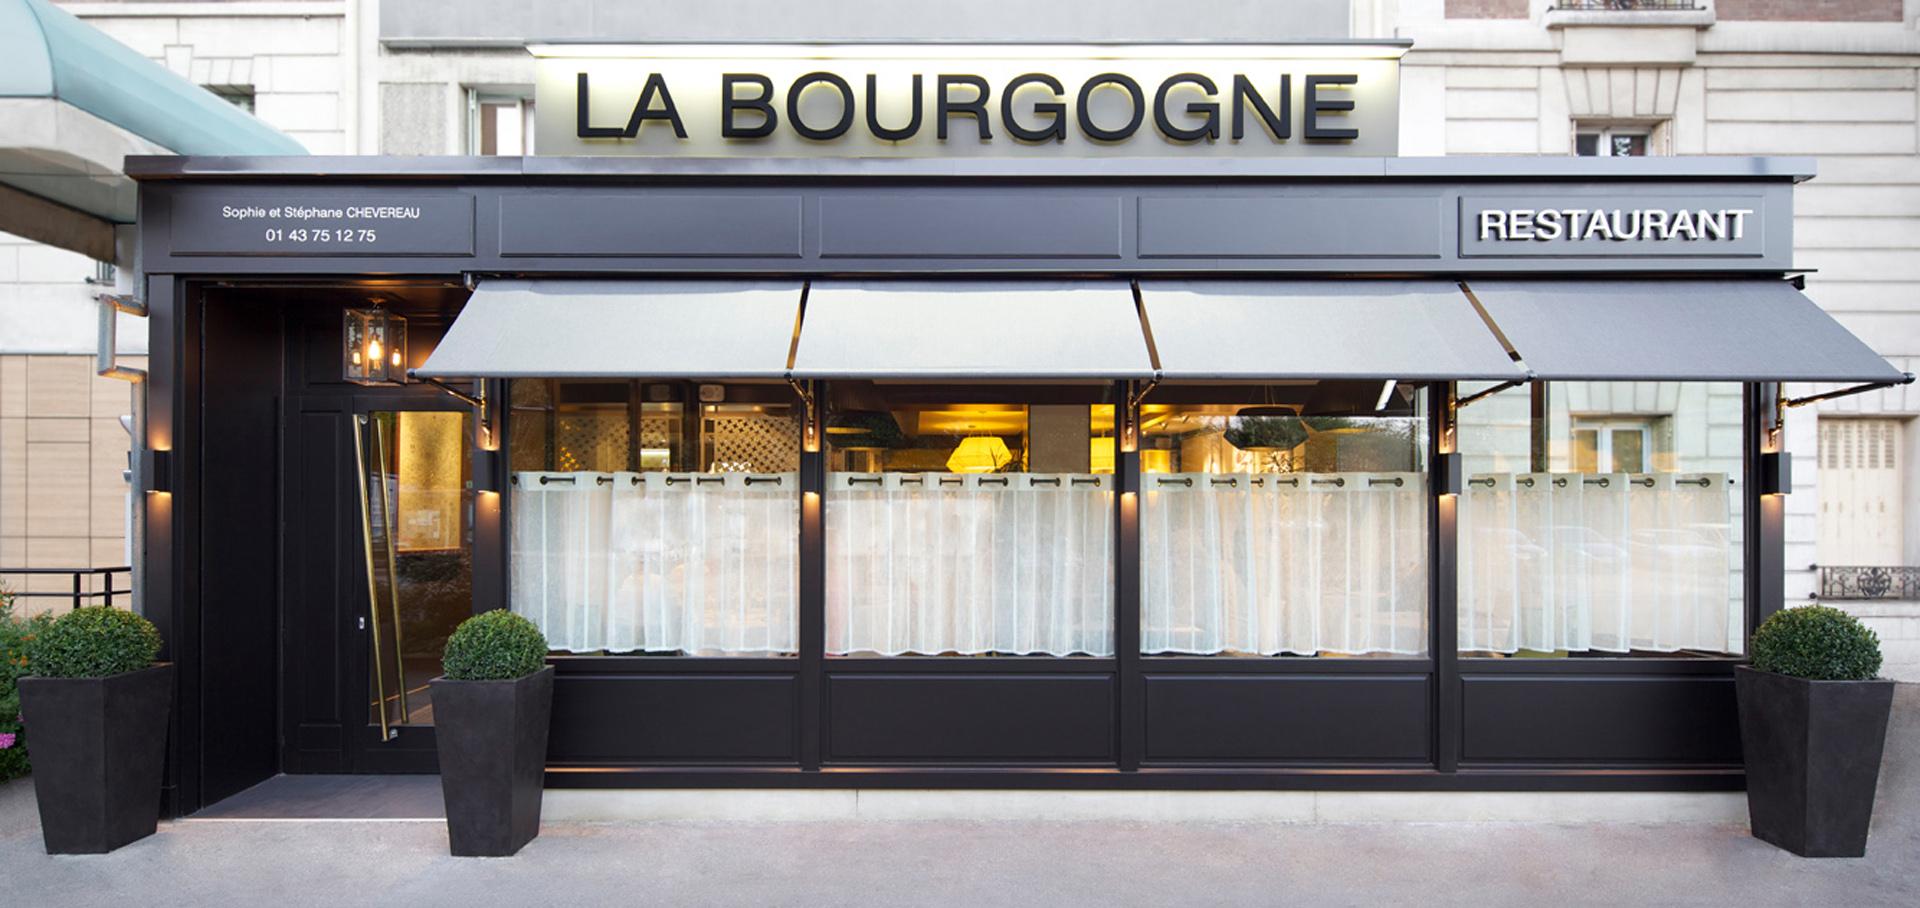 Adhérent LA BOURGOGNE - photo #92